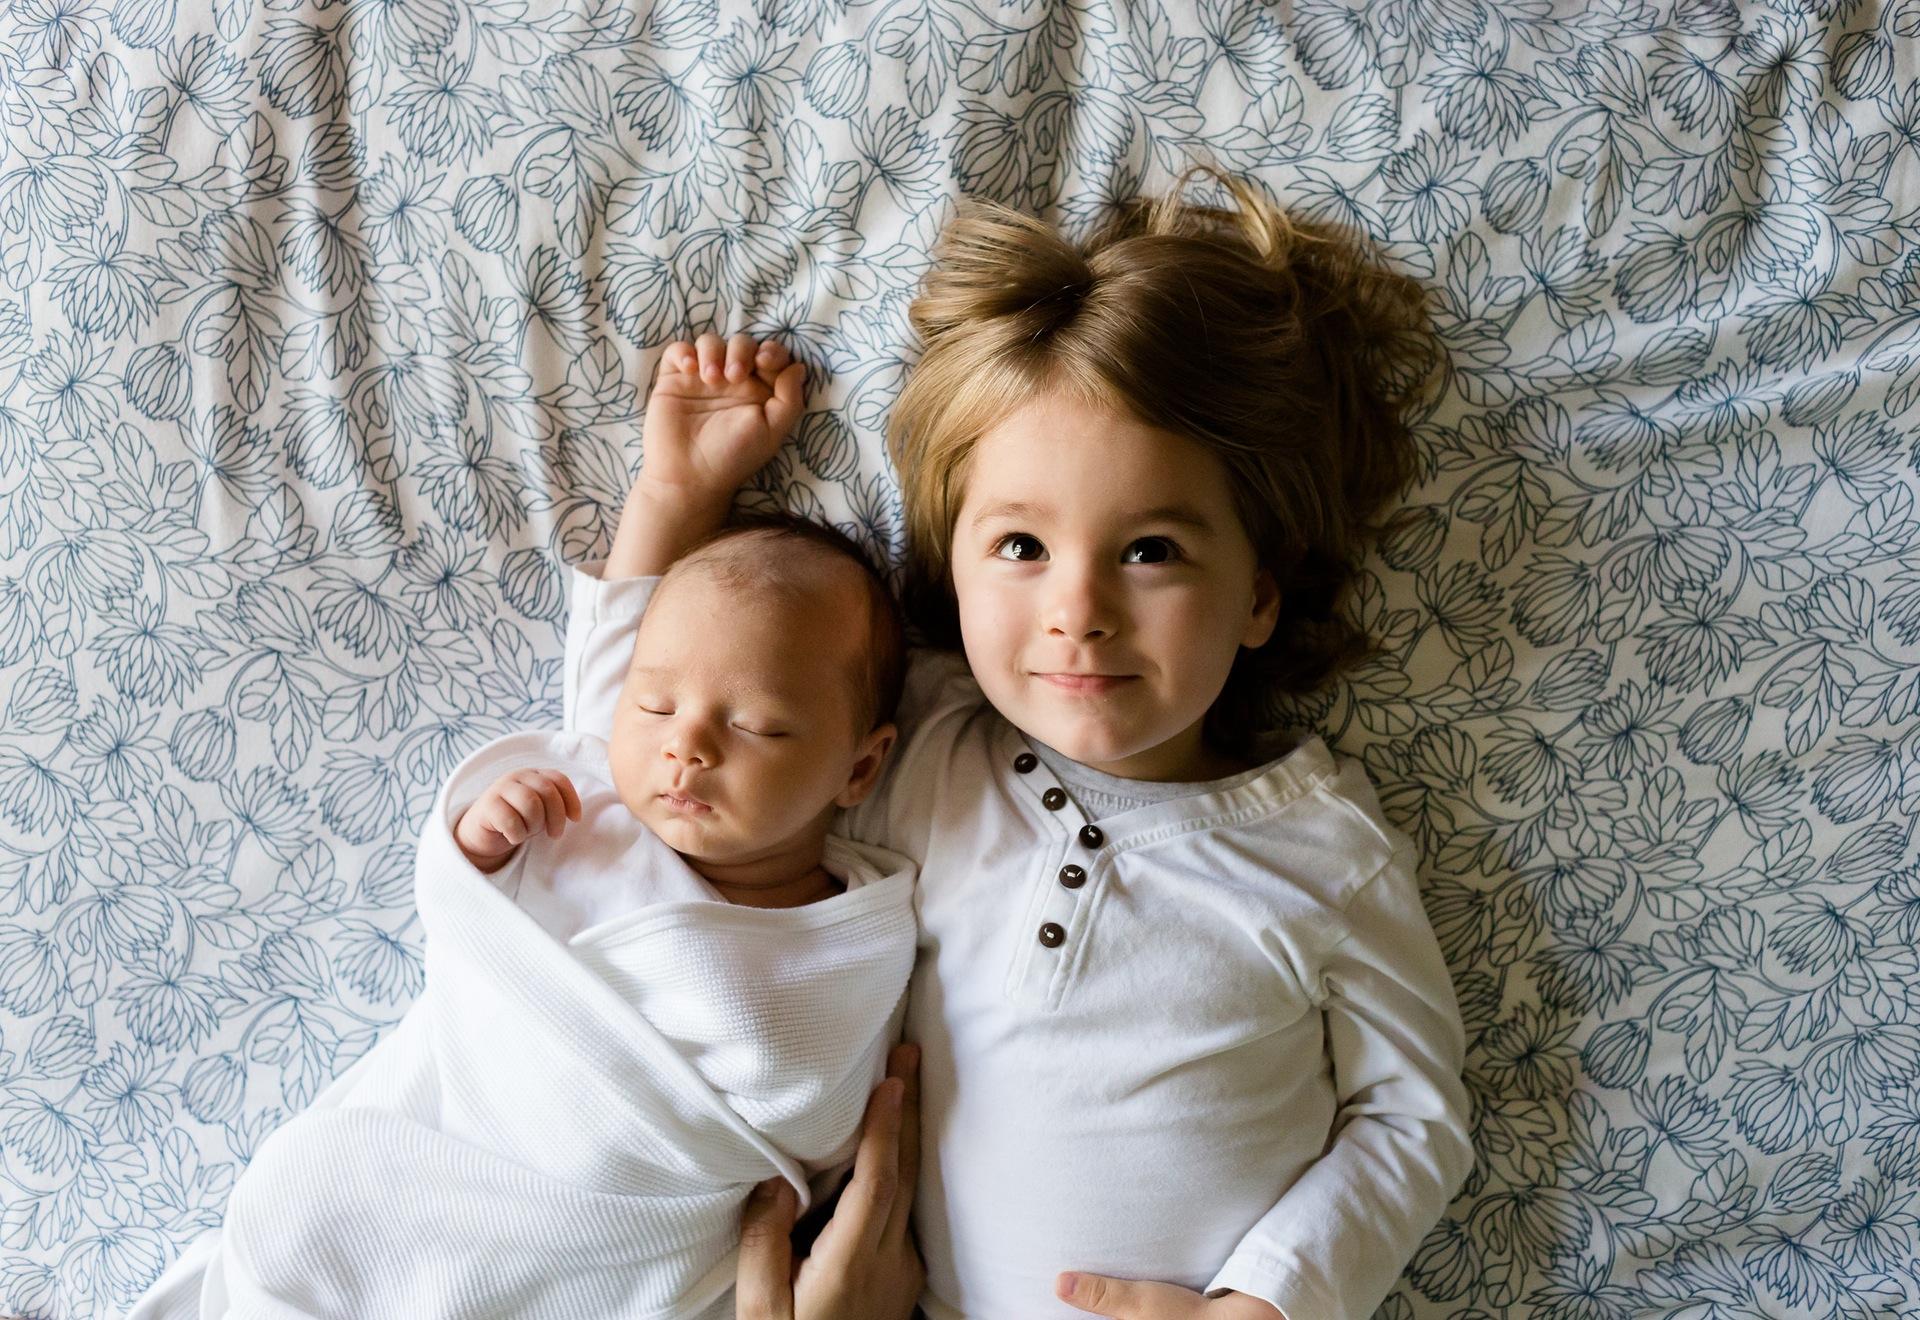 hautpflege beim säugling